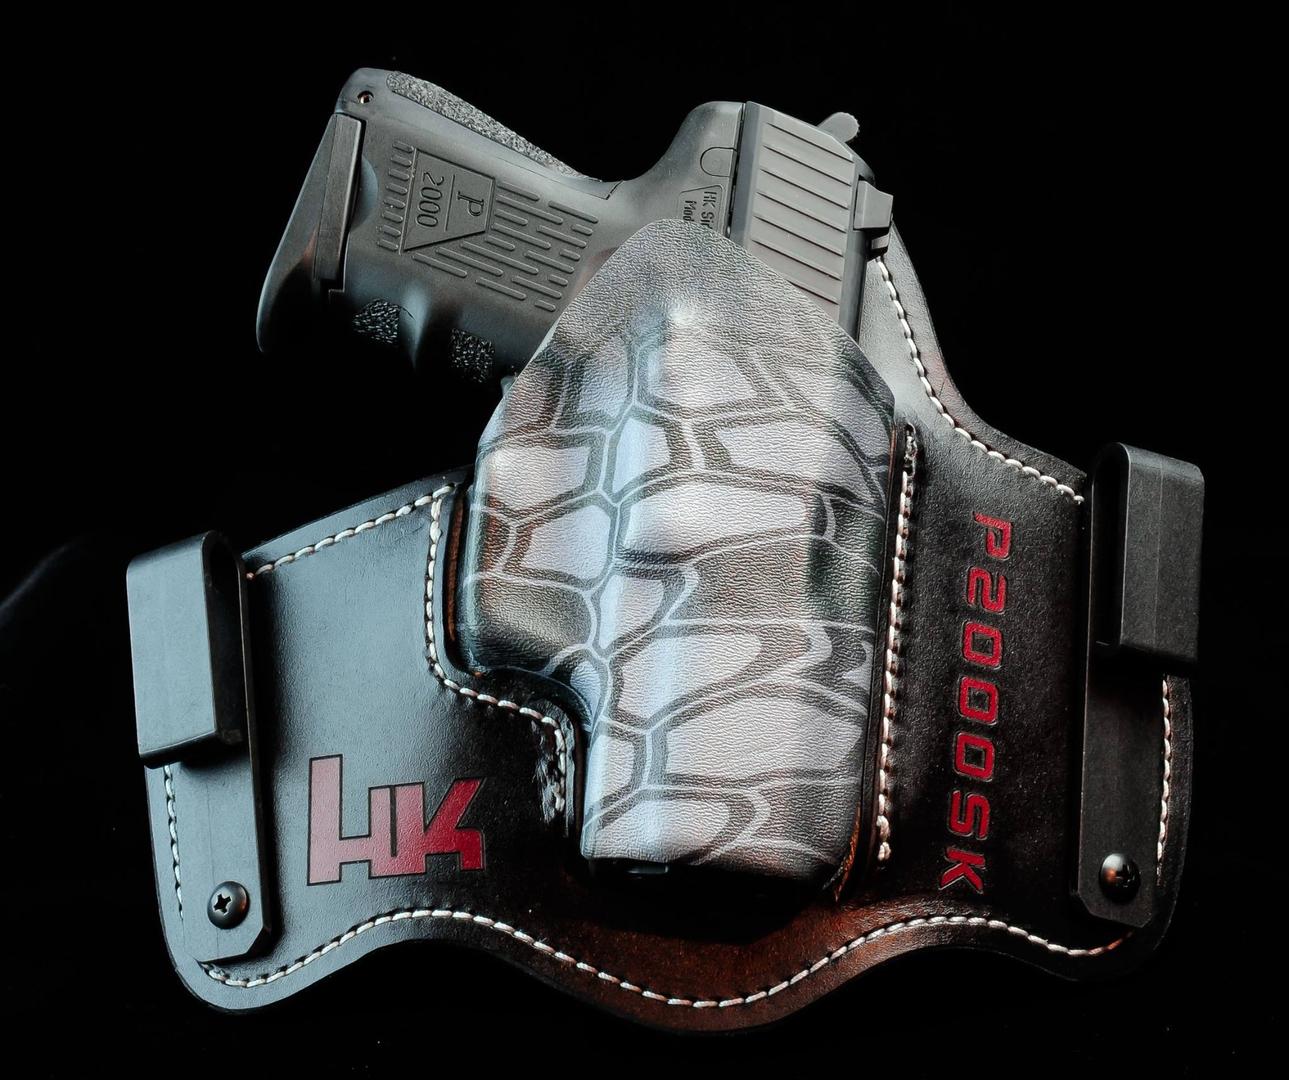 HK45C kydex holster compatibility?-hk.p2k.jpg